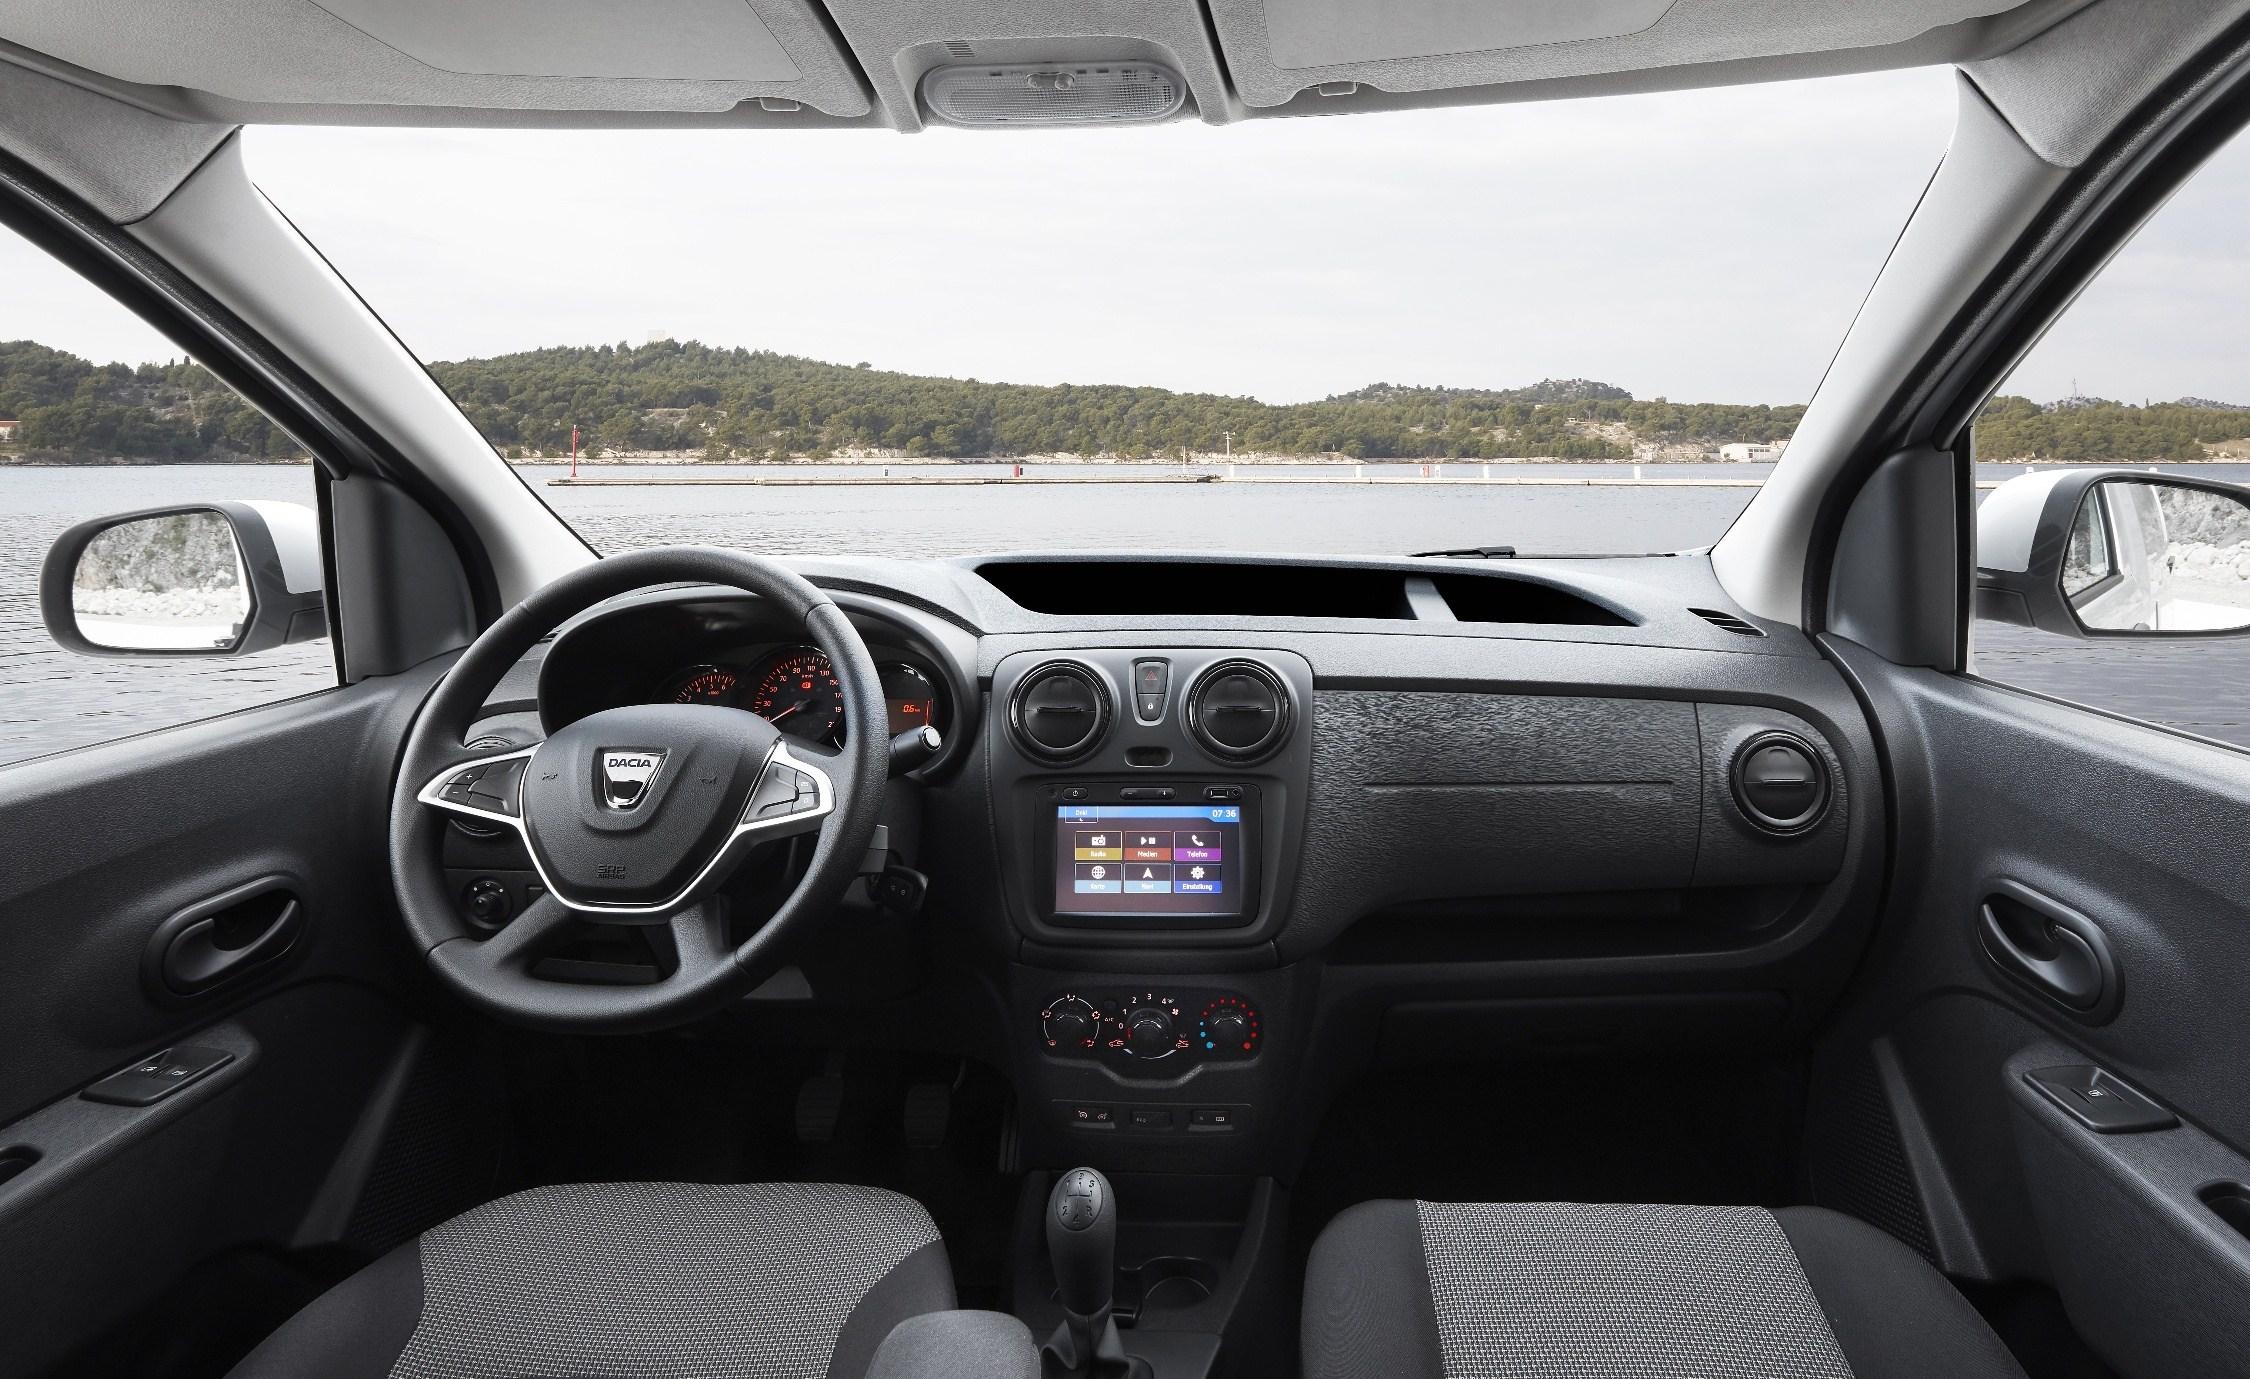 Dacia Dokker Van: Πρωταθλητής και στην οικονομία συντήρησης!